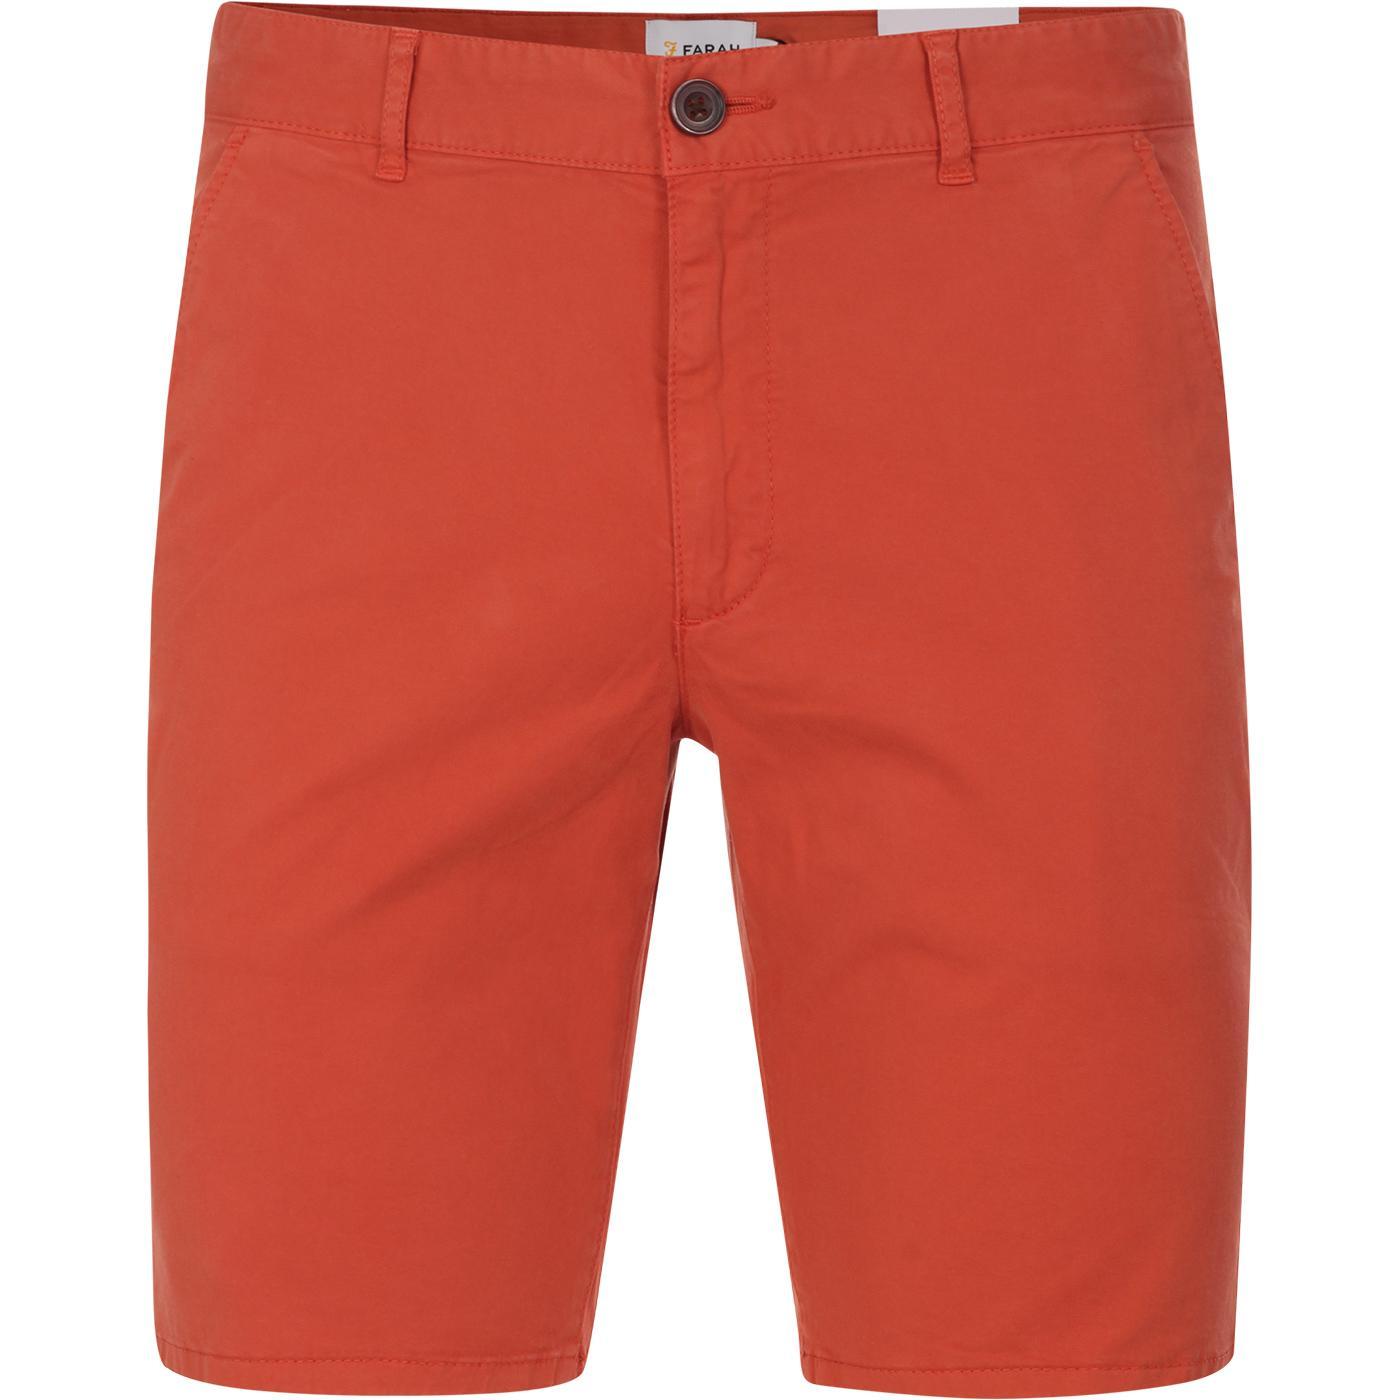 Hawk FARAH Retro Garment Dye Chino Shorts (TO)